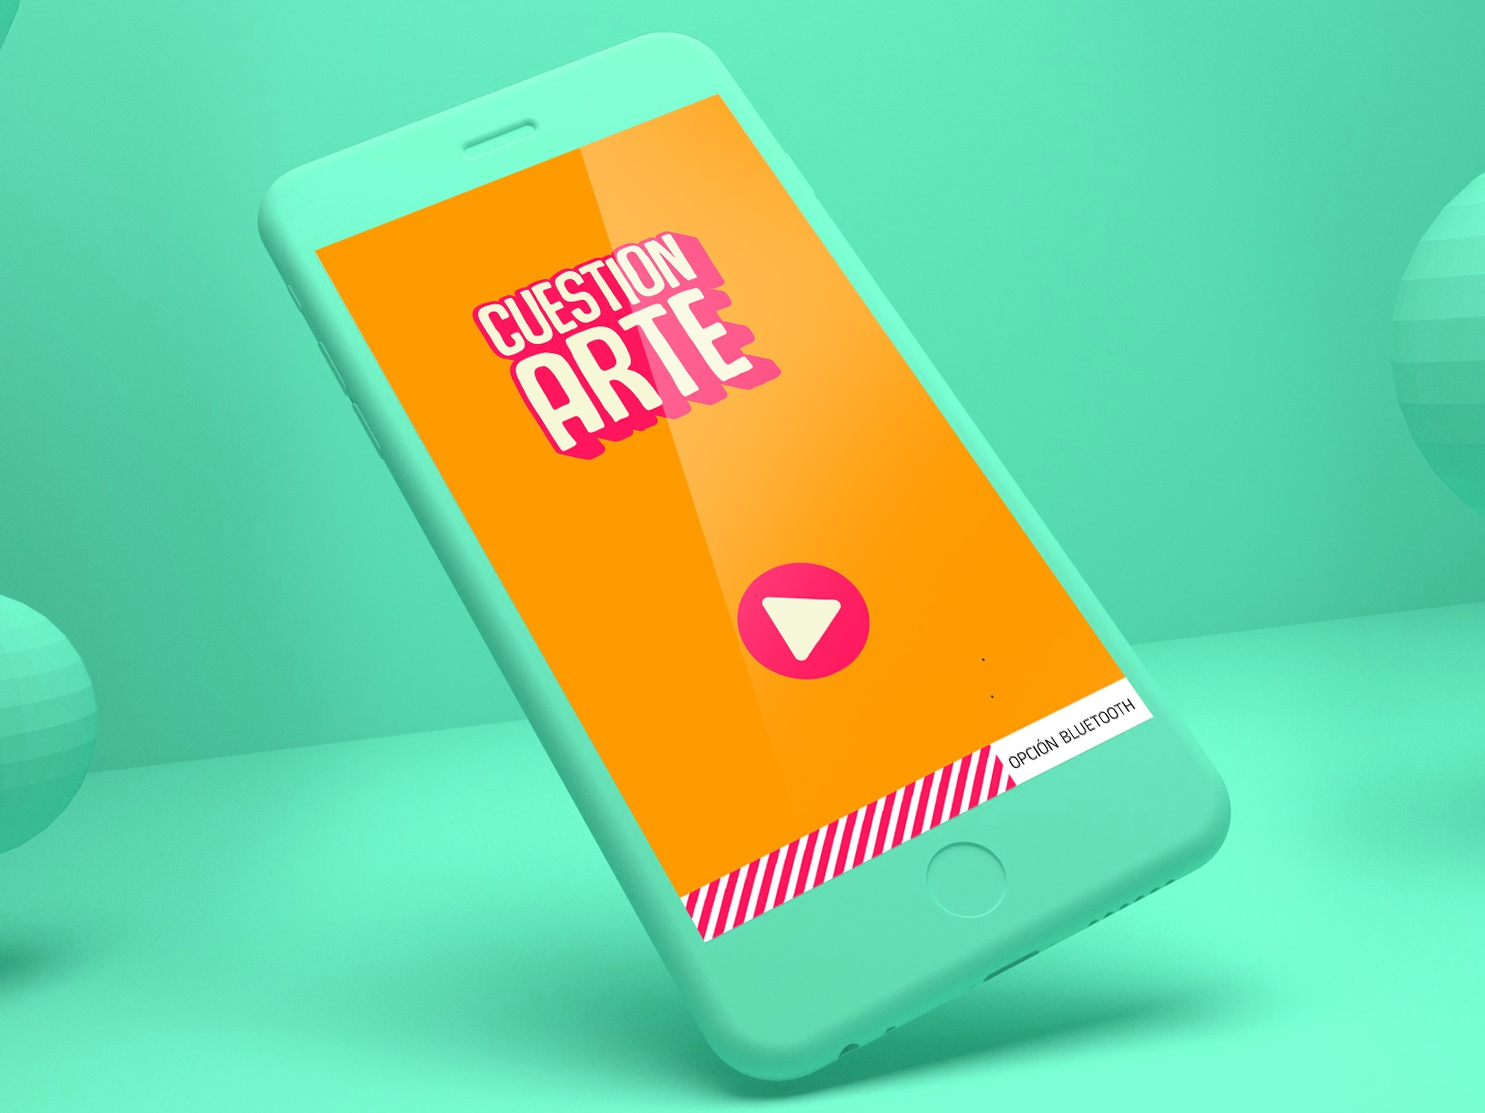 CUESTION-ARTE mobile icon app ux ui graphic design brand web logotype illustrator identity illustration typography type logo branding vector minimal flat design